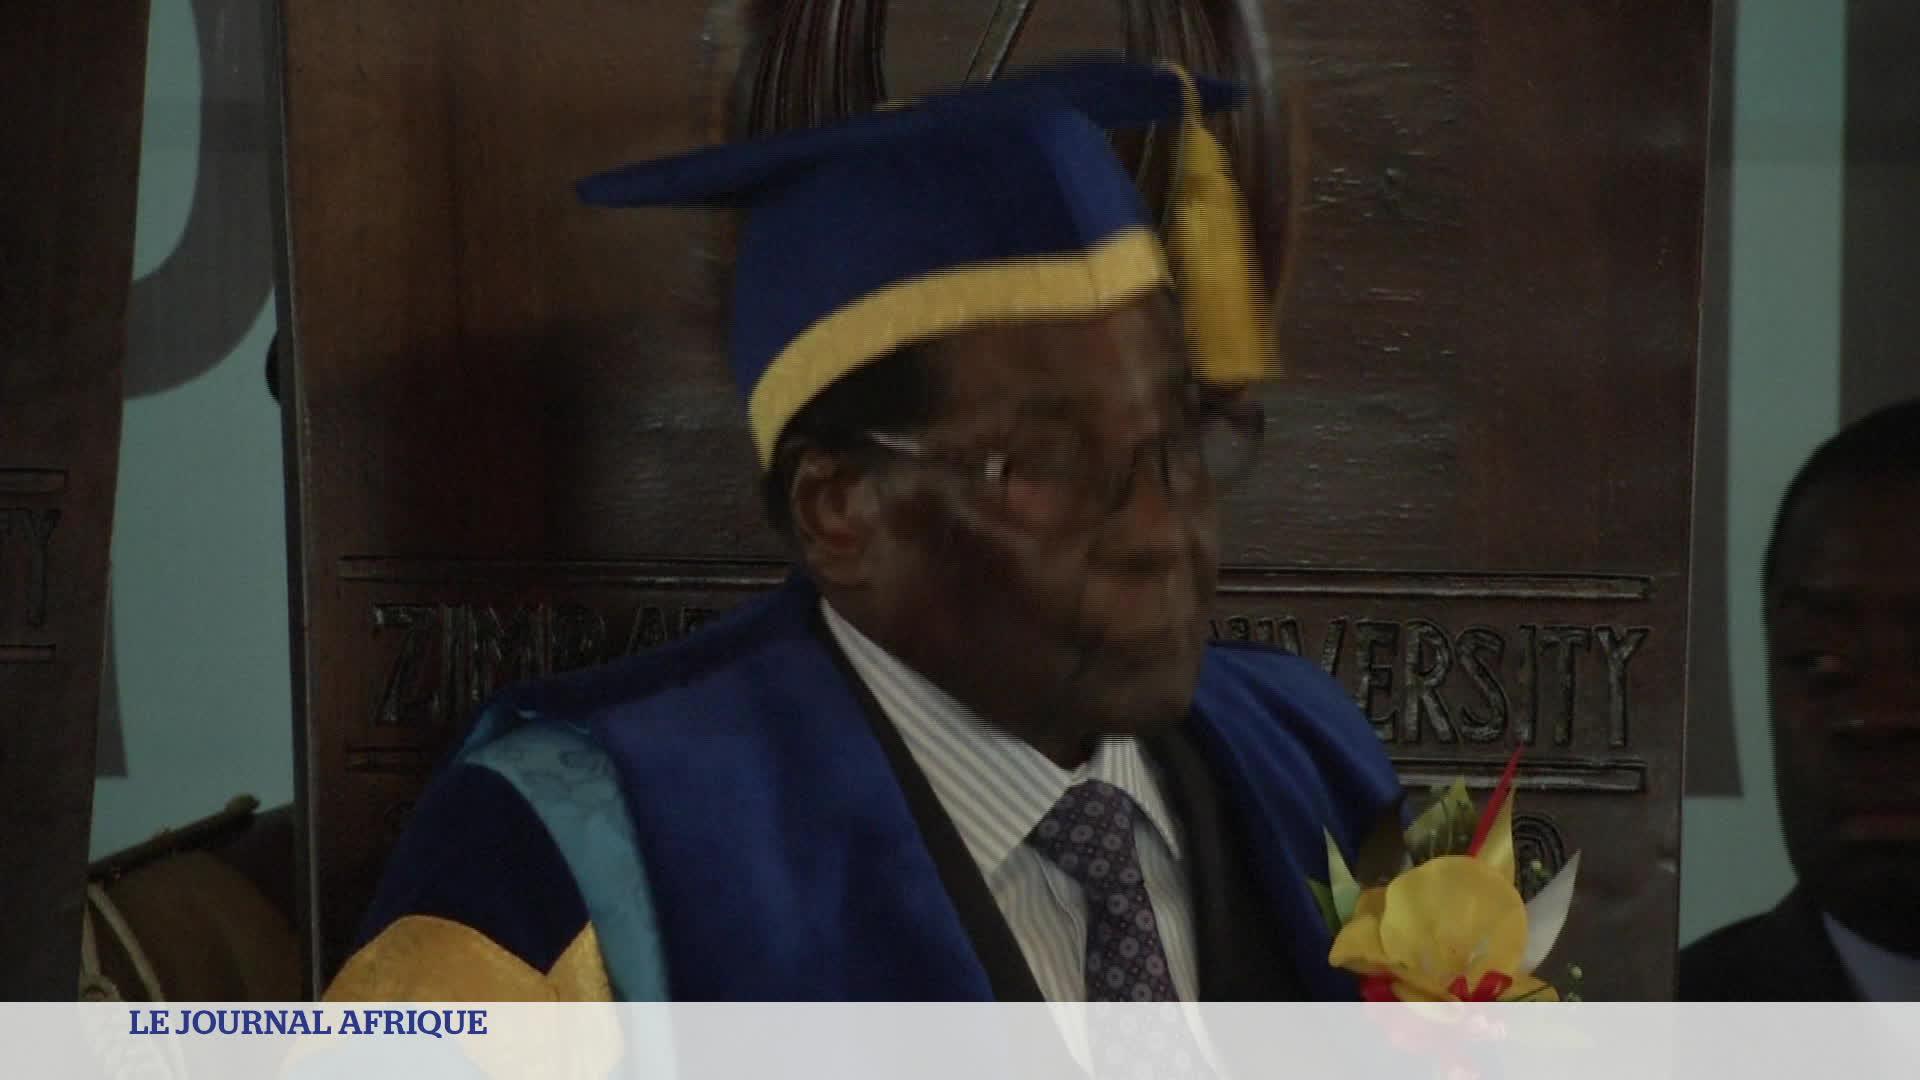 L'incertitude autour de Mugabe au Zimbabwe